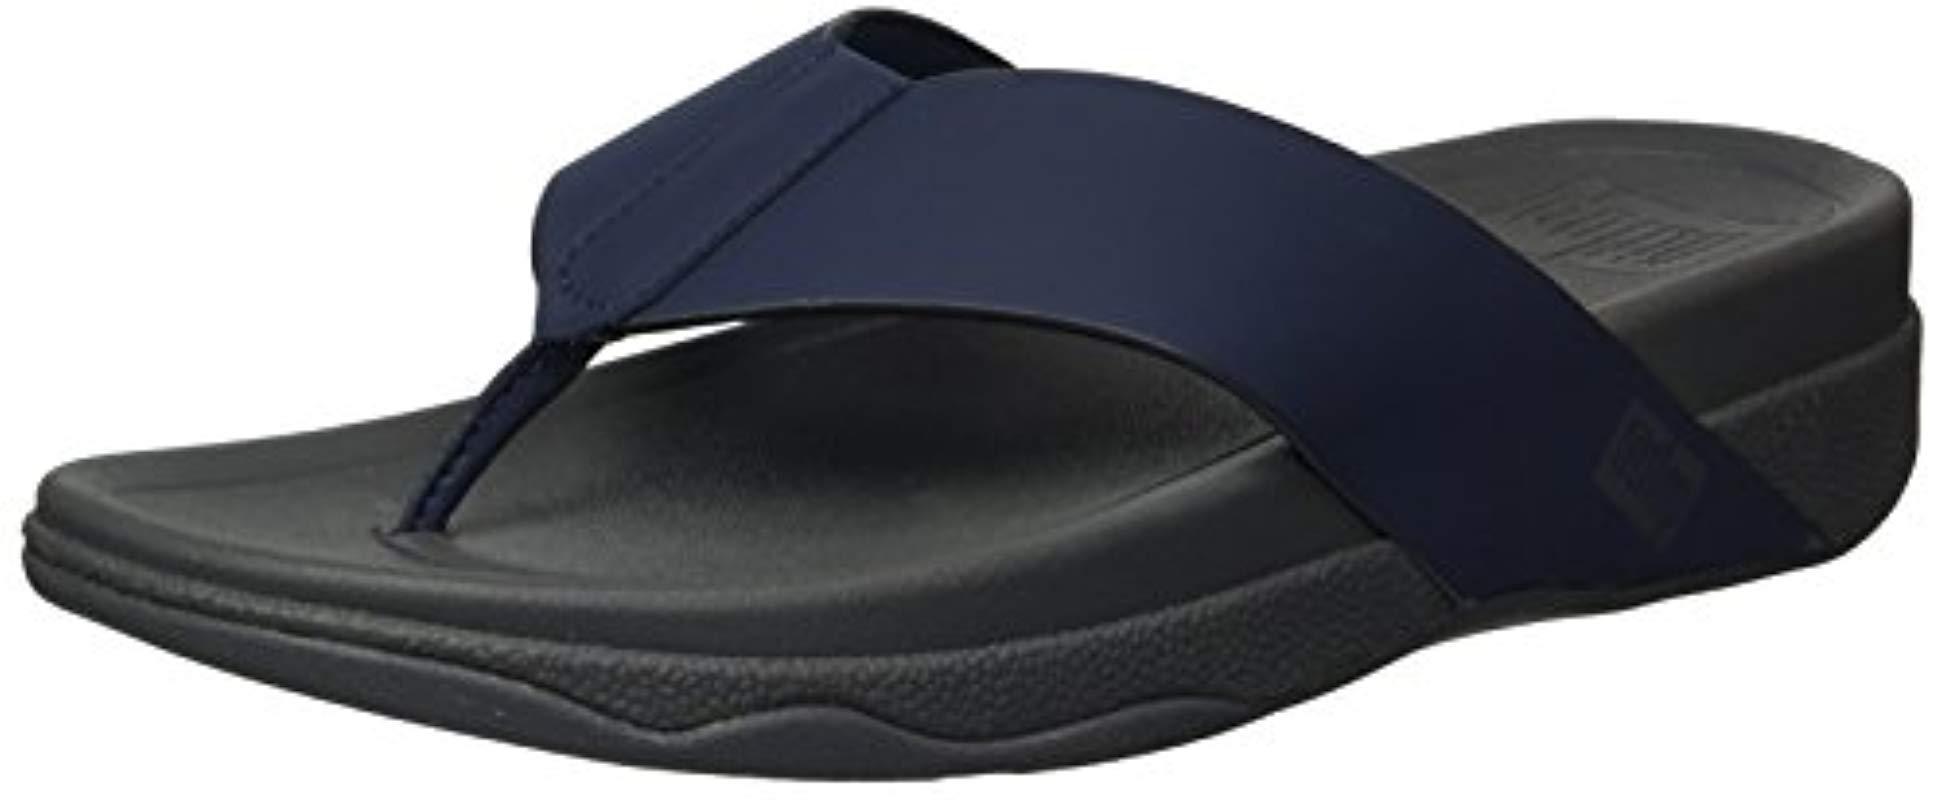 5c5fe228e52 Fitflop - Blue Surfer Toe Post In Neoprene Flip-flop for Men - Lyst. View  fullscreen